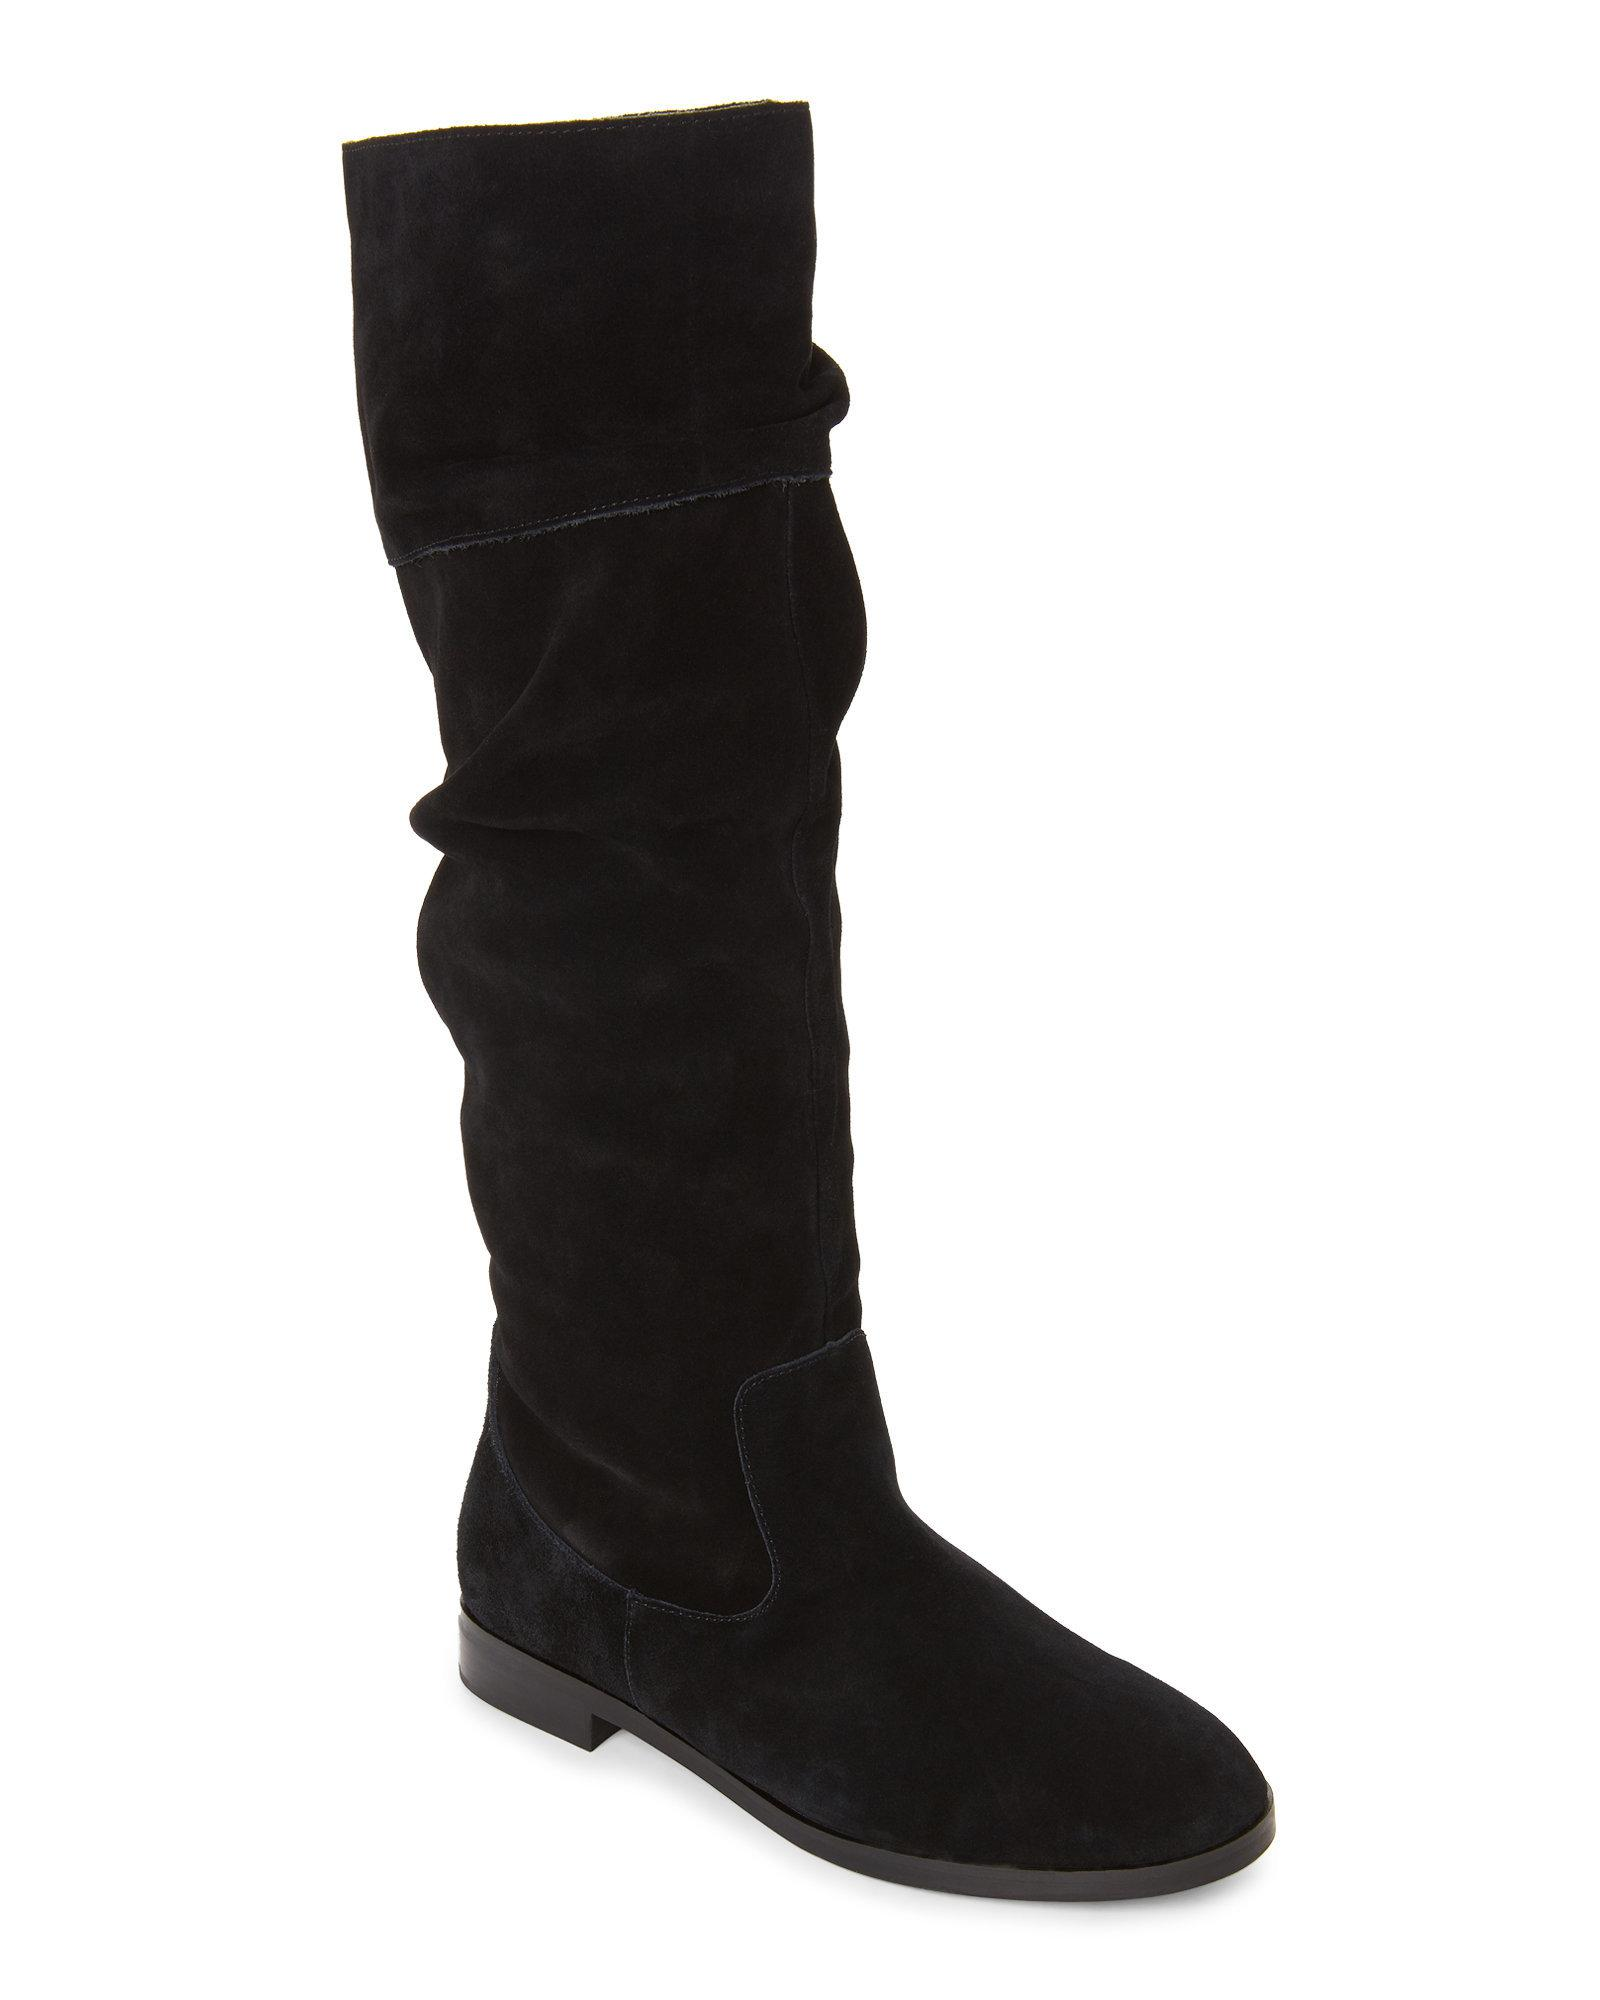 aff1c57b08b Lyst - Steve Madden Womens Balen Suede Almond Toe Knee High Fashion ...